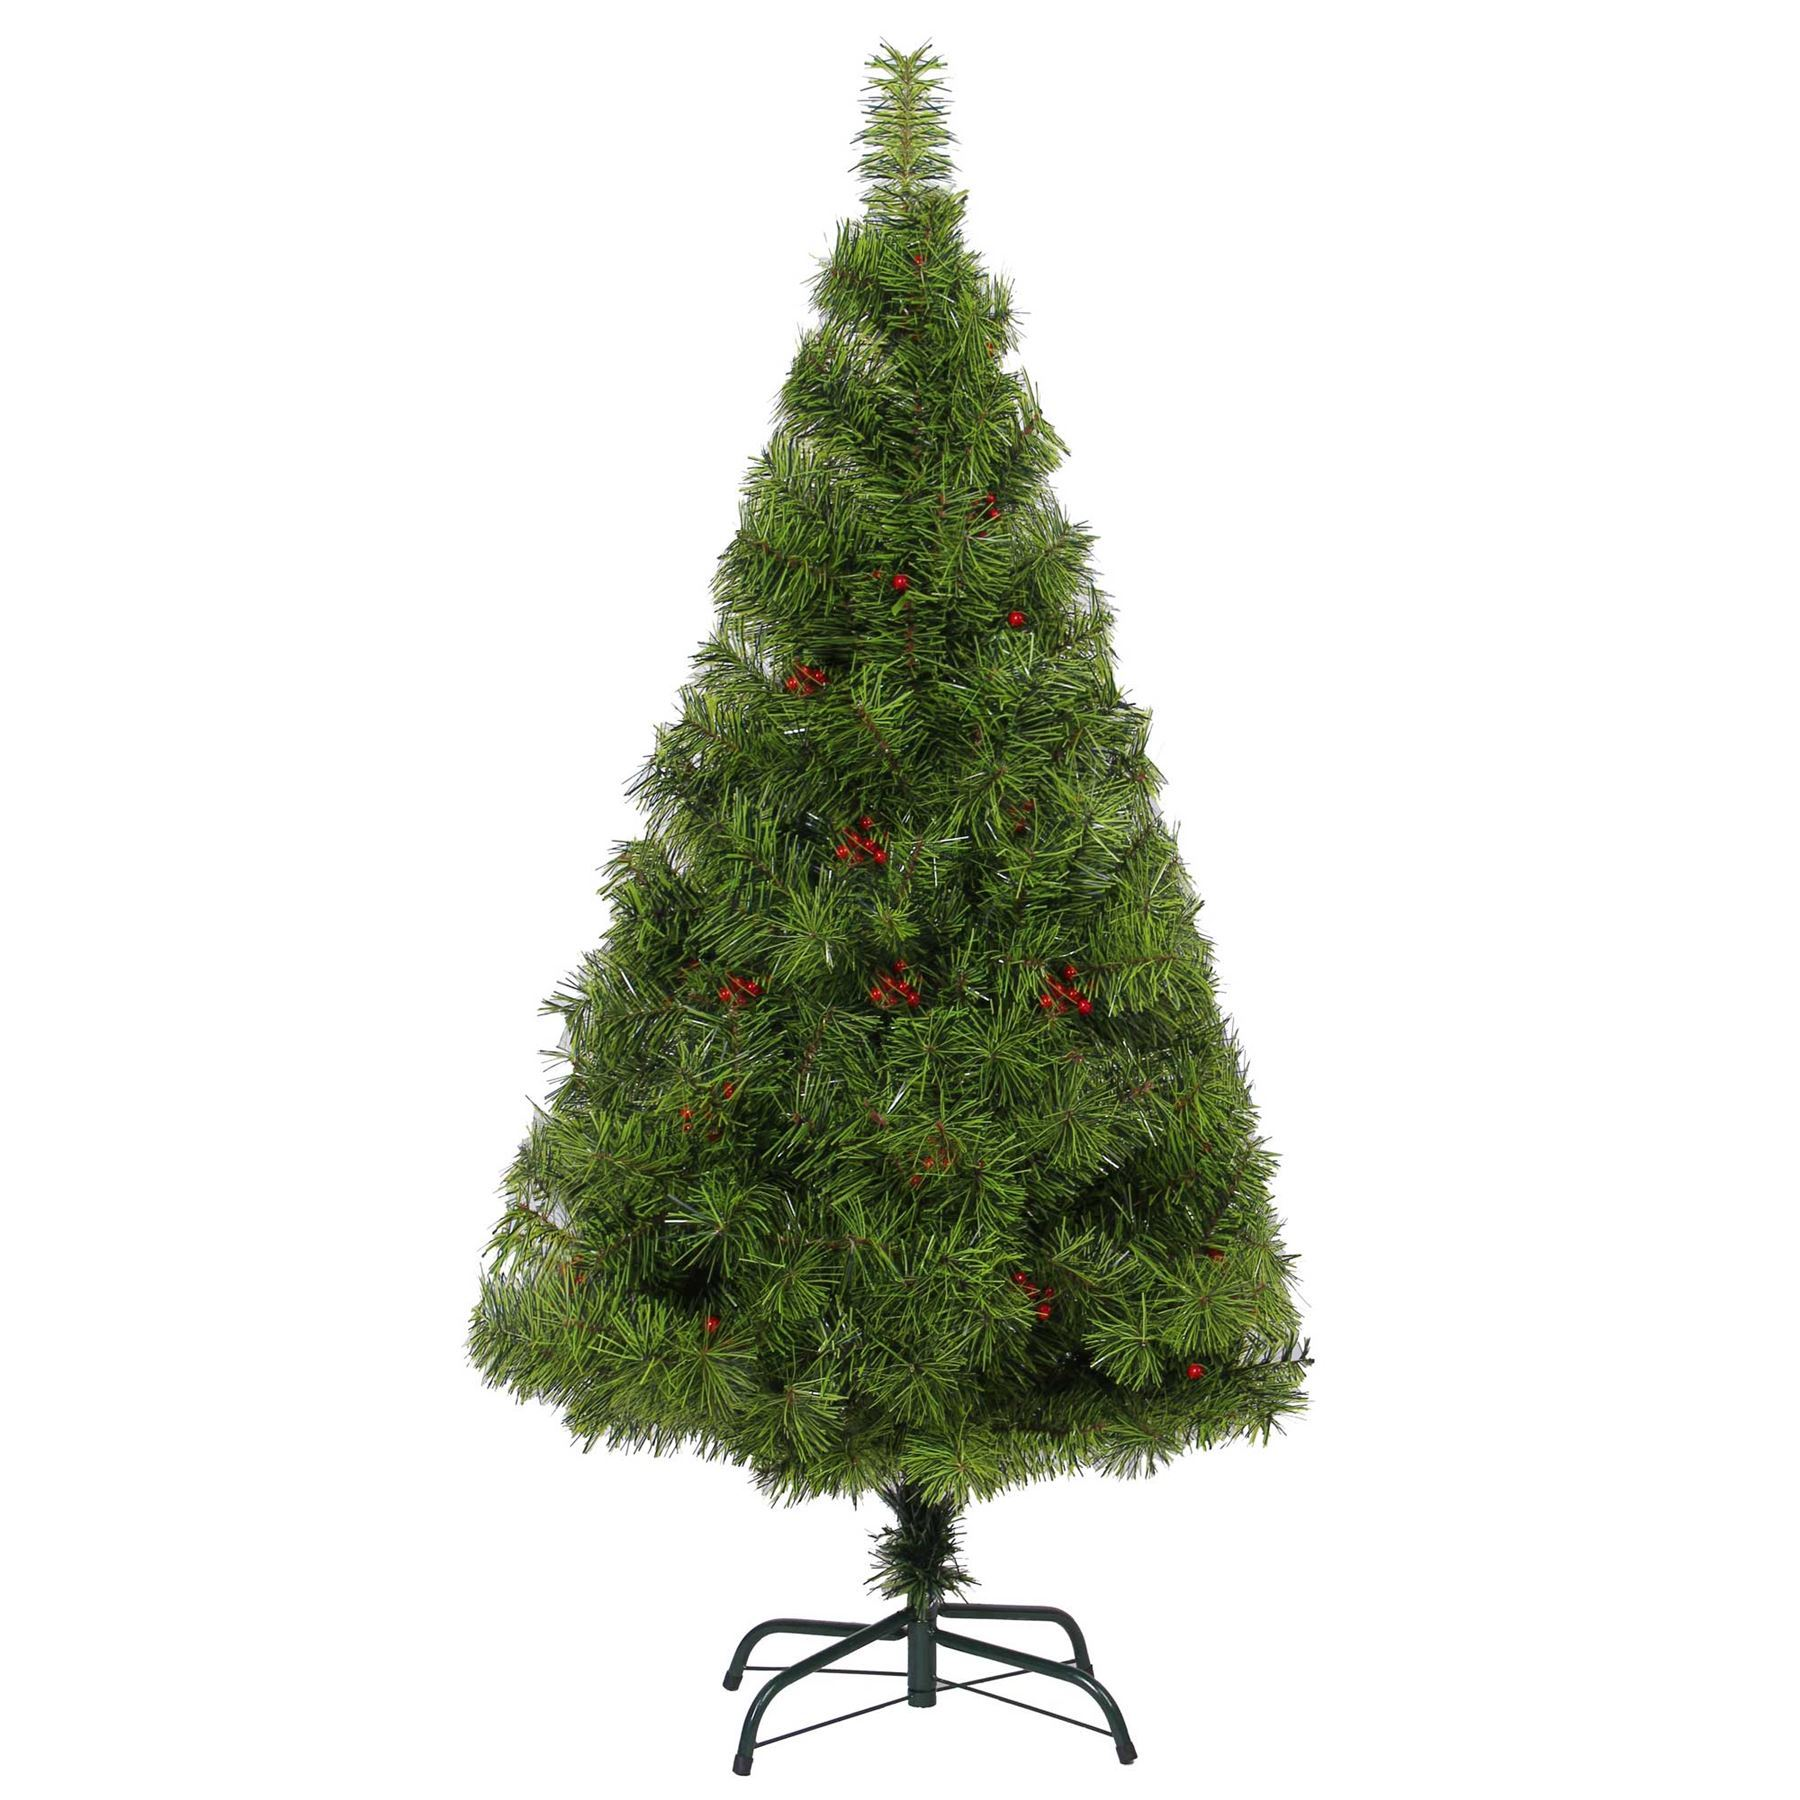 Does Lowes Sell Christmas Trees: Artificial Christmas Tree Pre-Lit LED Fibre Optic Elegant